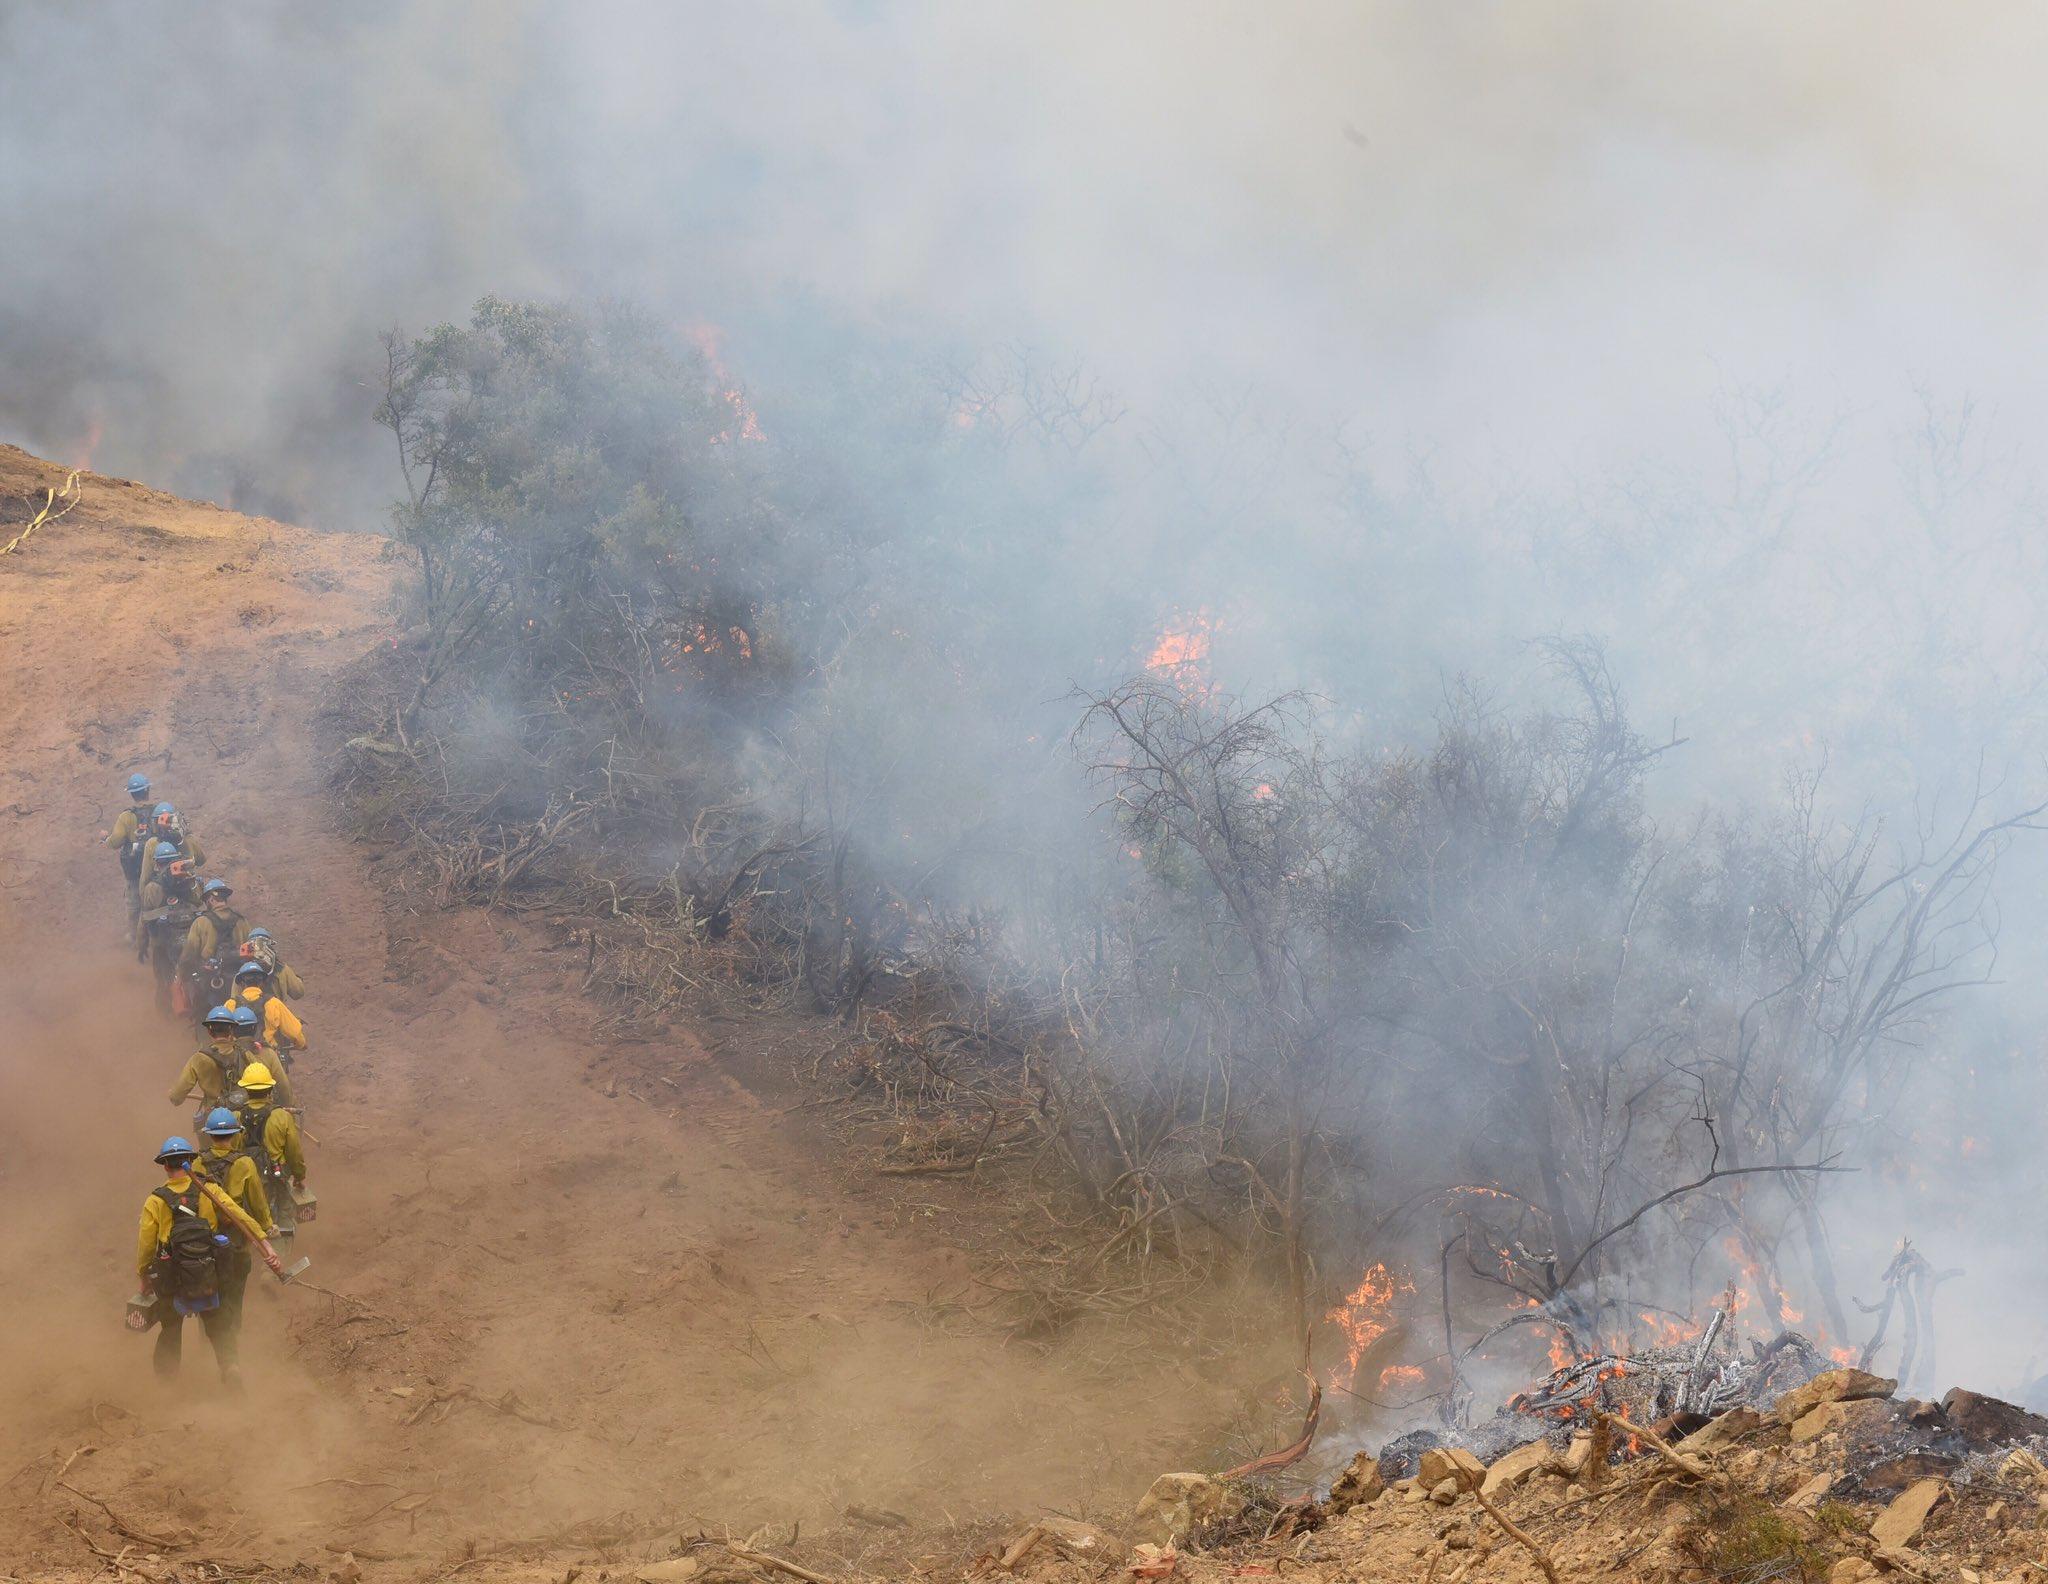 (Credit: Mike Eliason, Santa Barbara County Fire public information officer)